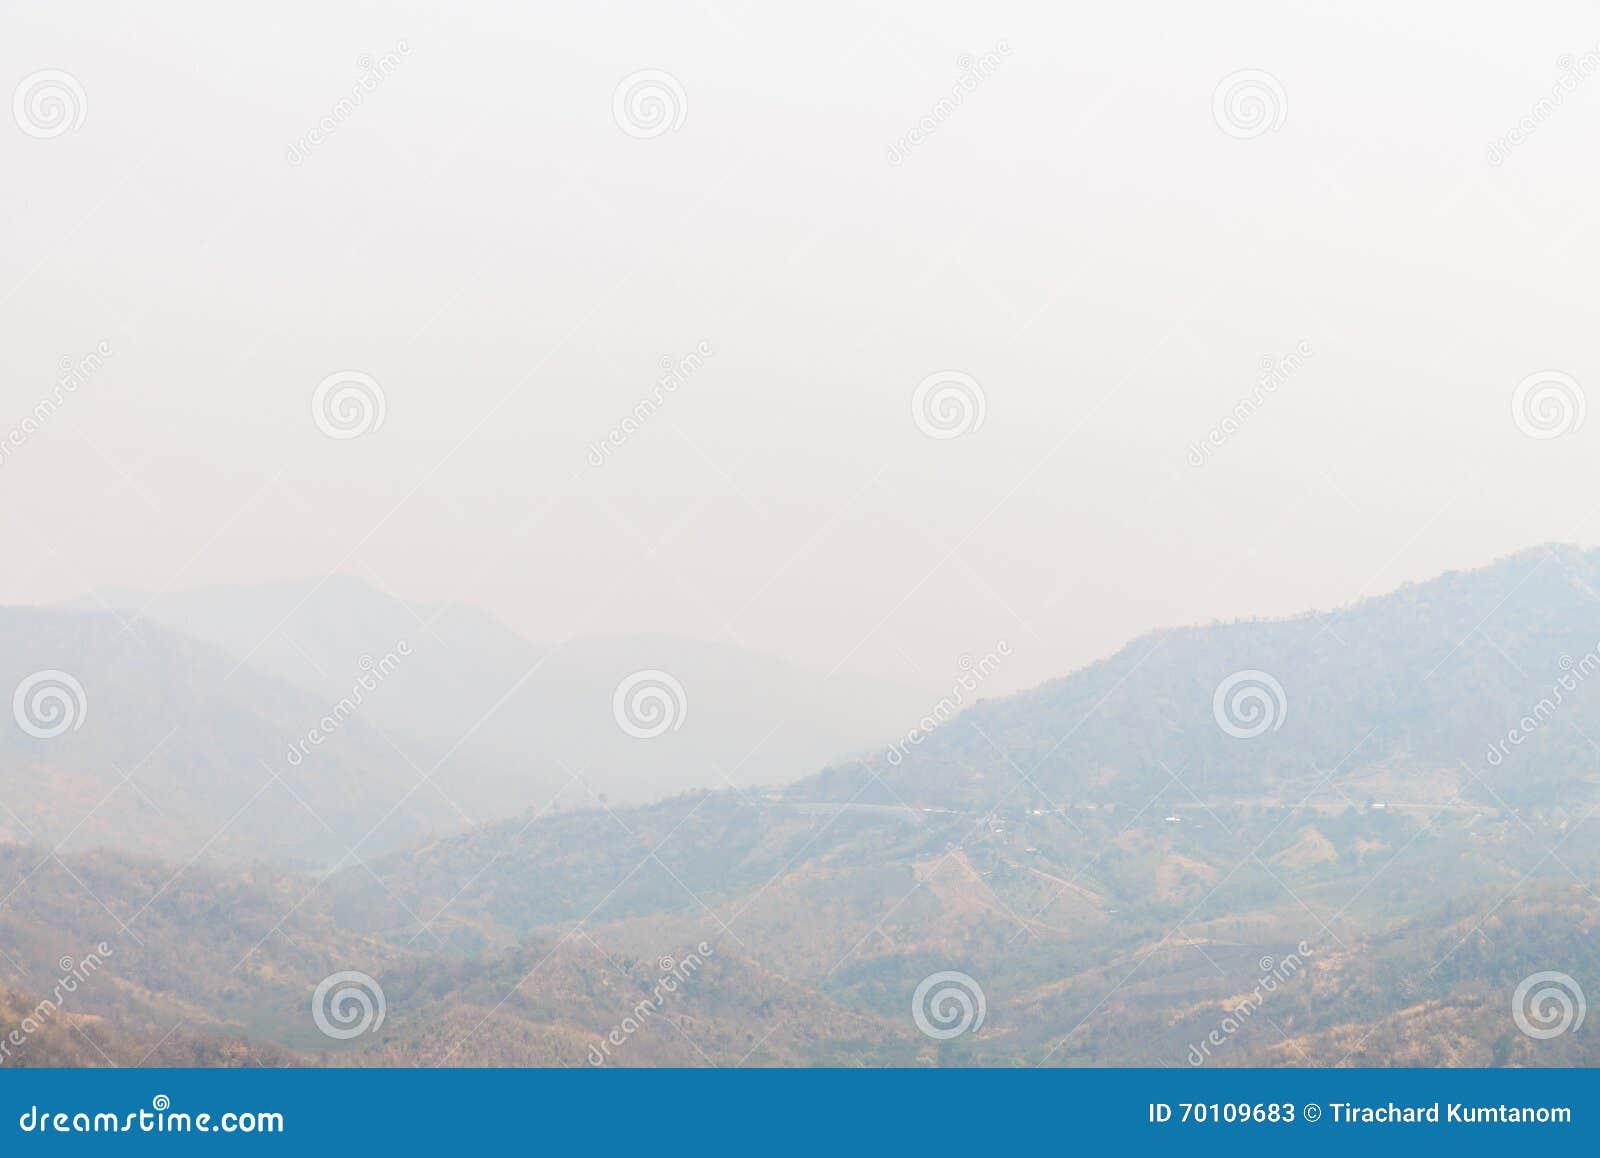 Слои горы Forest Hills